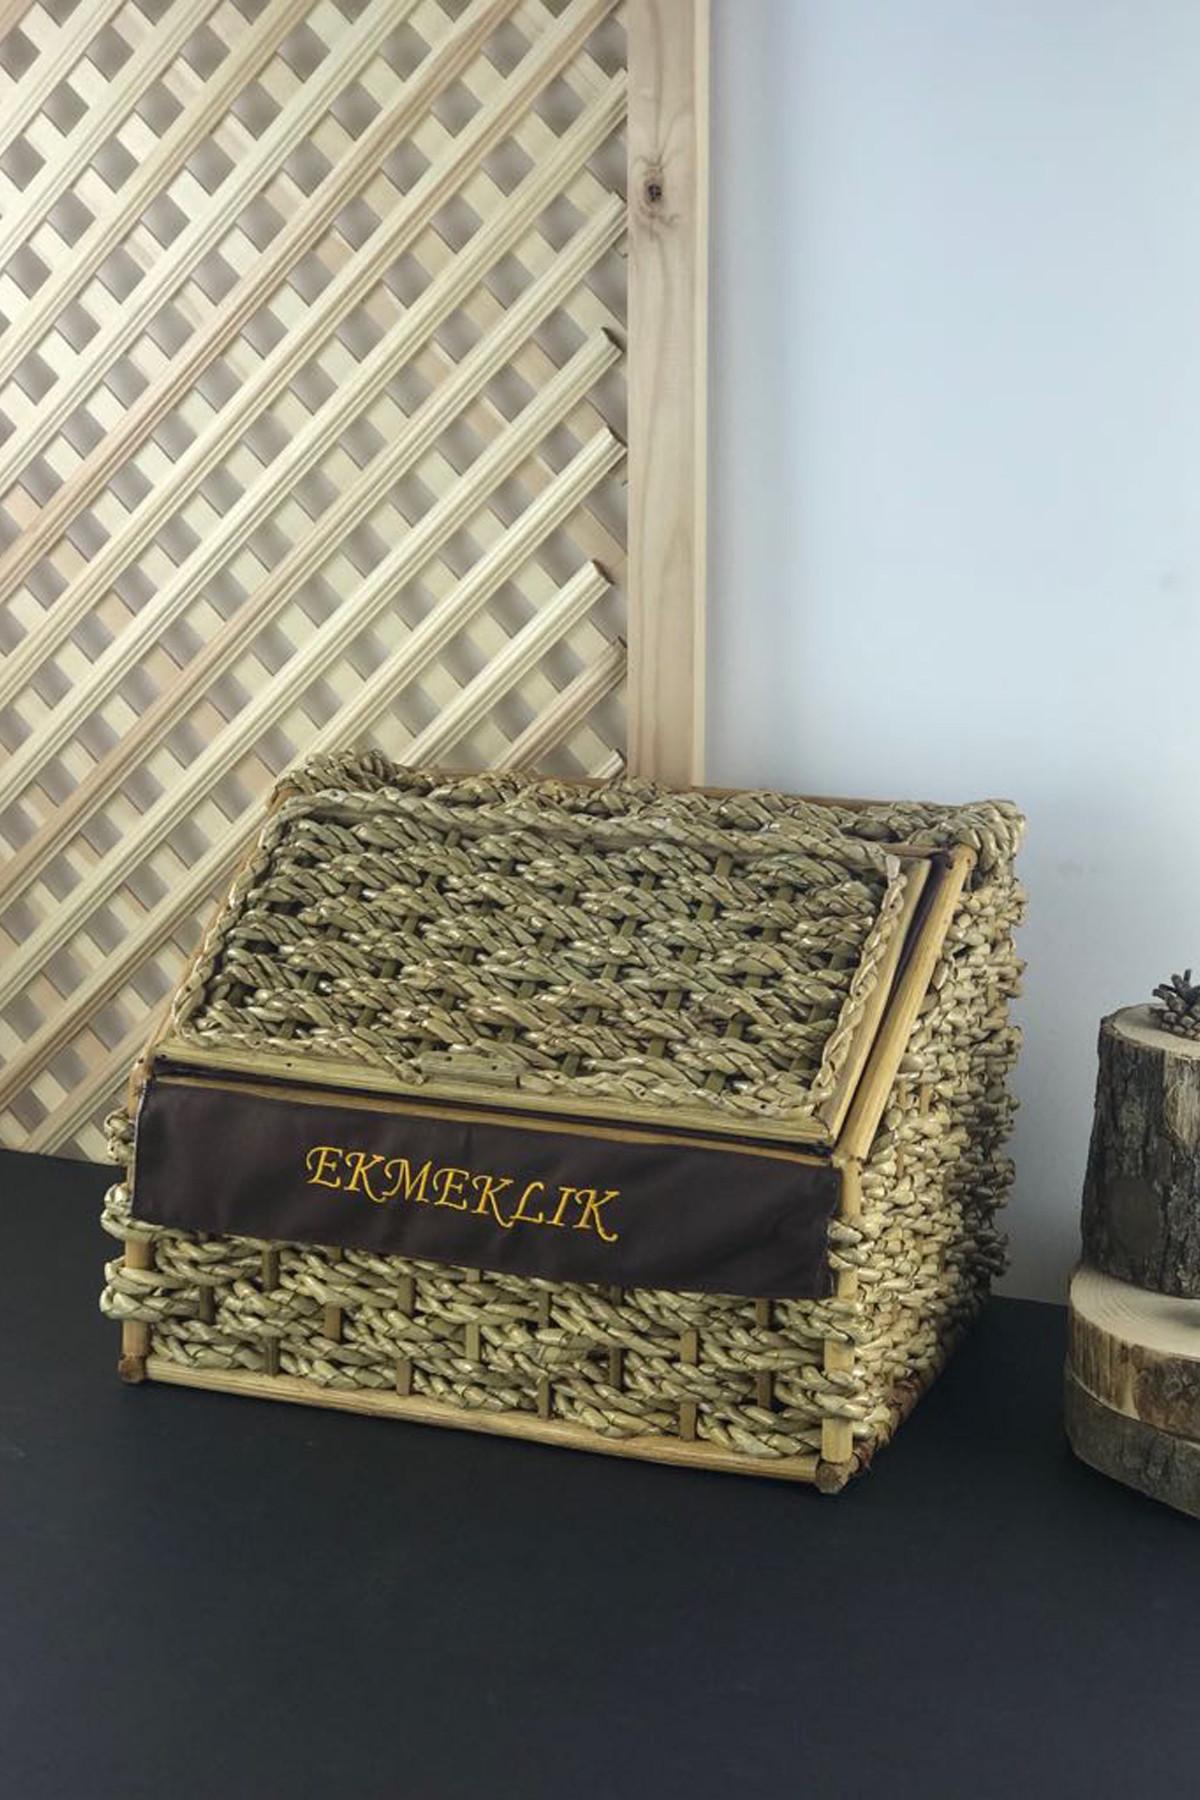 Sepetcibaba - Hasır Örgü Krem Dik Ekmek Sepeti